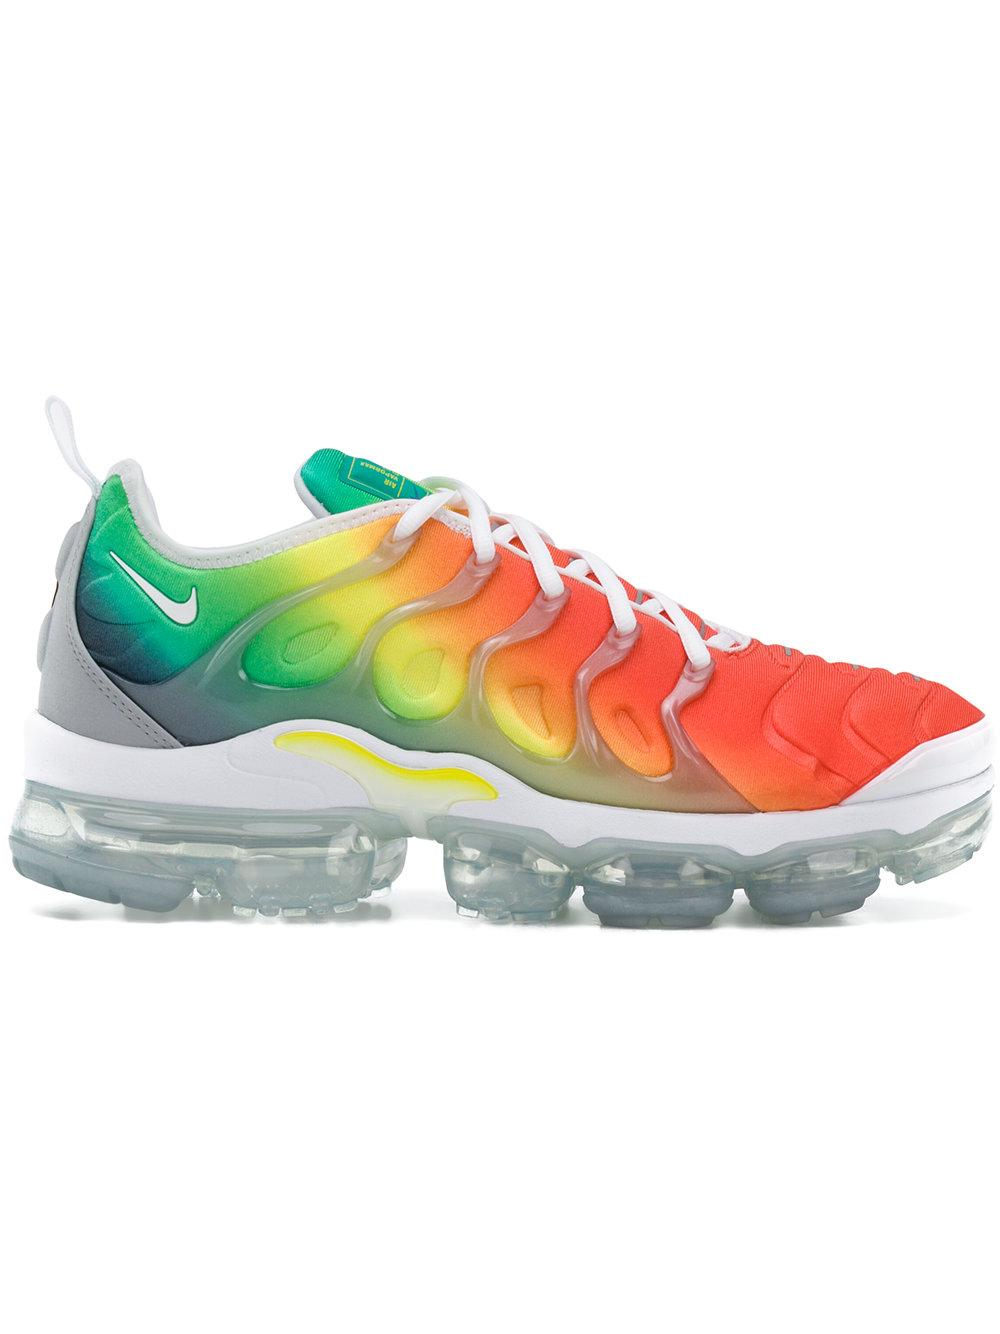 2122fde9d5efb Nike Air Vapormax Plus Sneakers In Multicolour